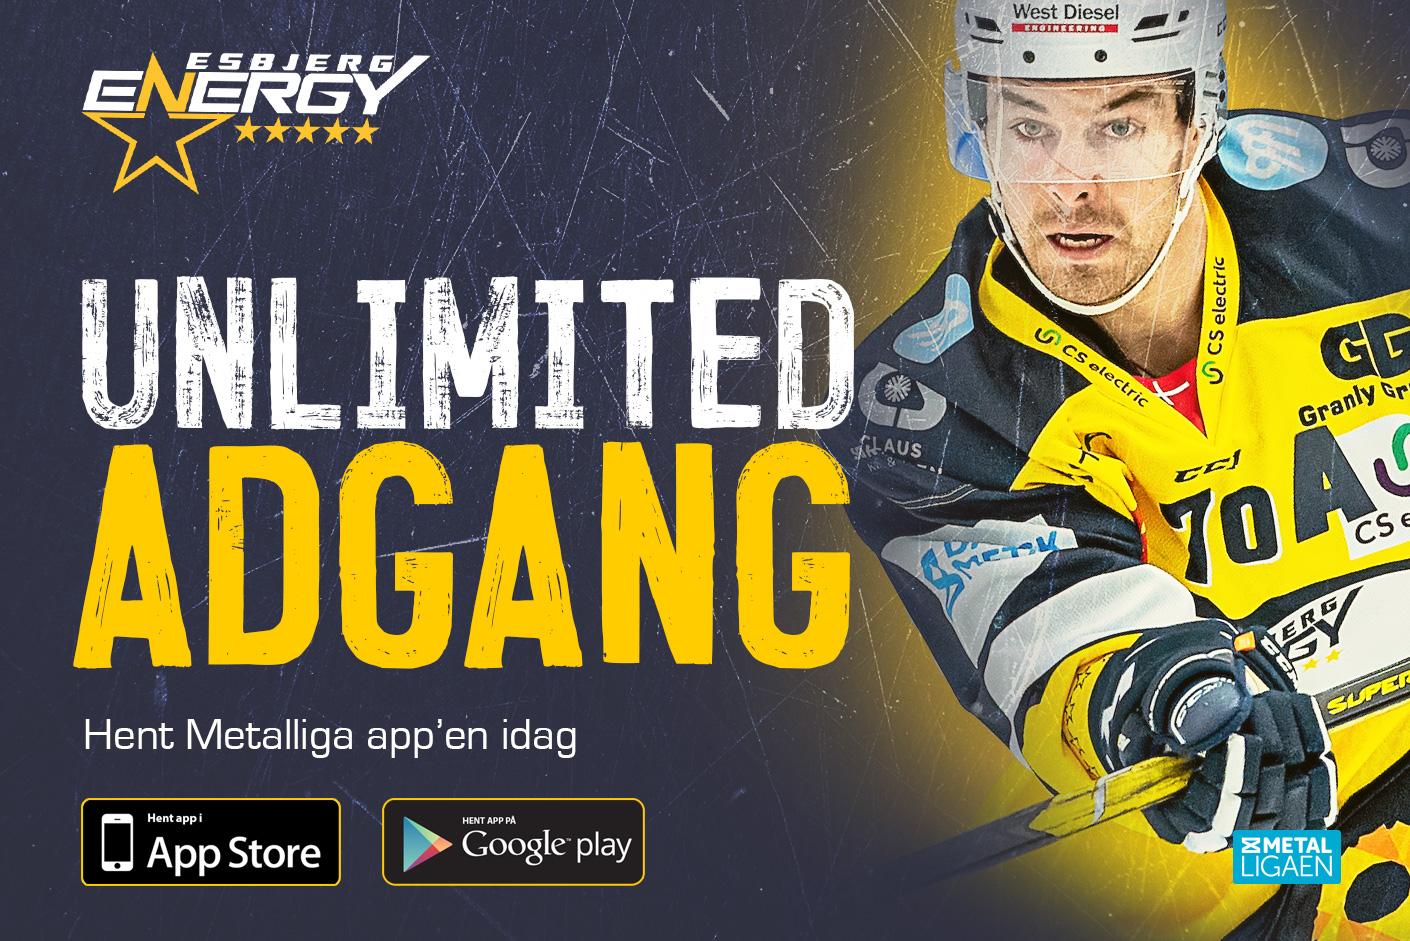 Esbjerg App.jpg